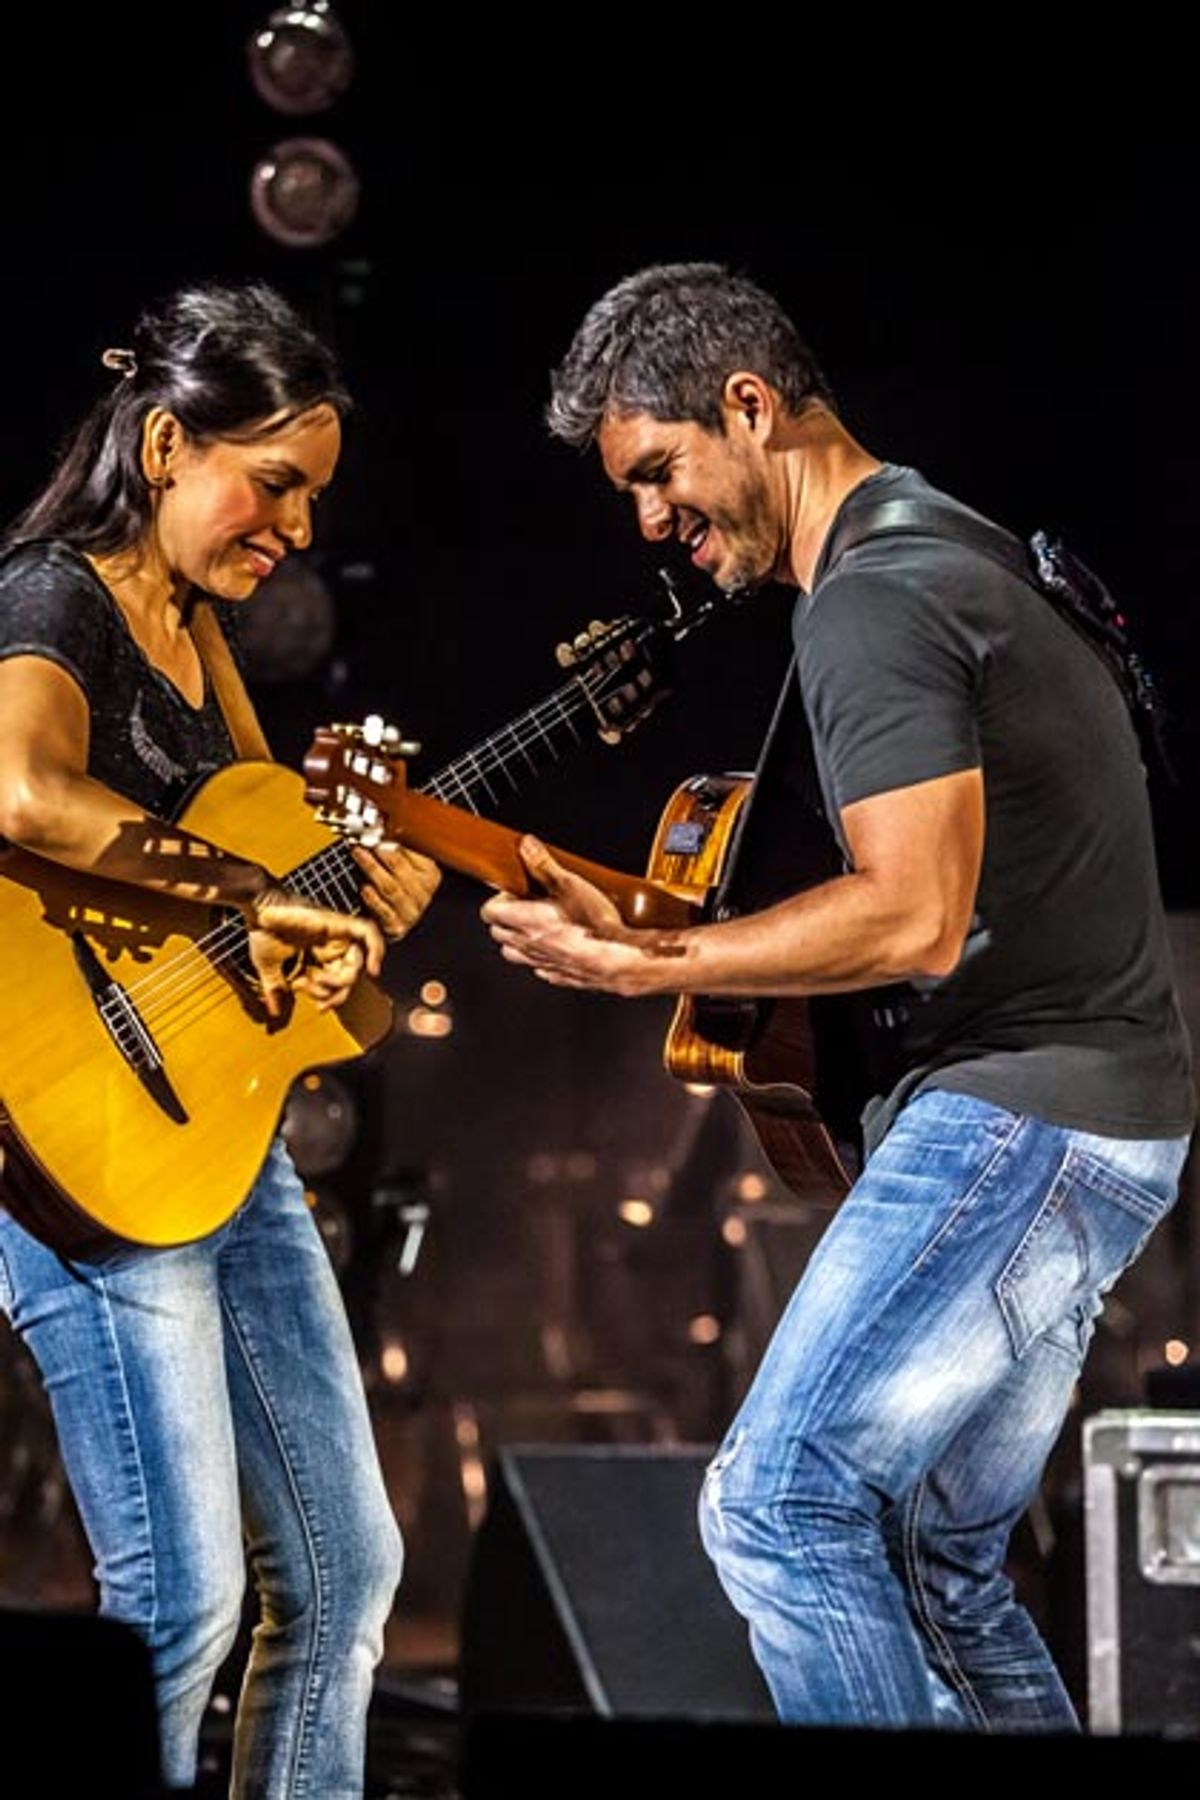 Shredding Nylon: Rodrigo y Gabriela